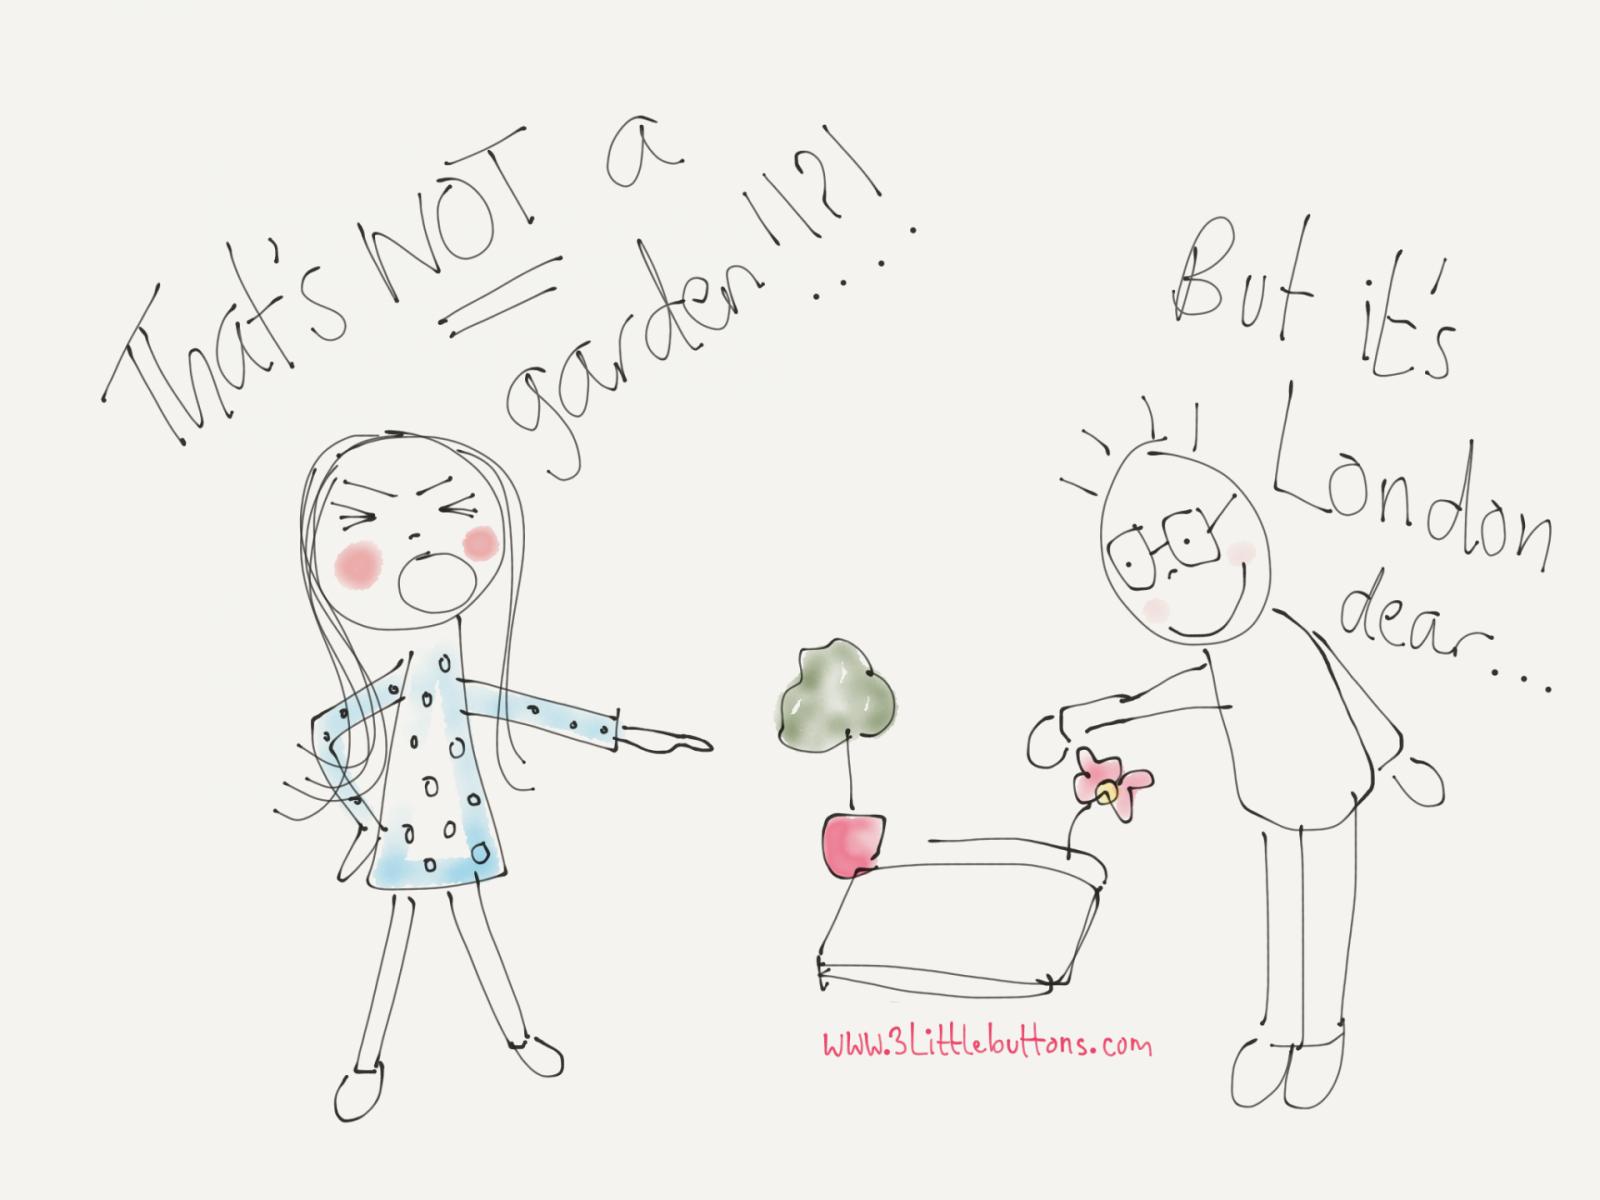 Garden Wars – The Small Garden Debate